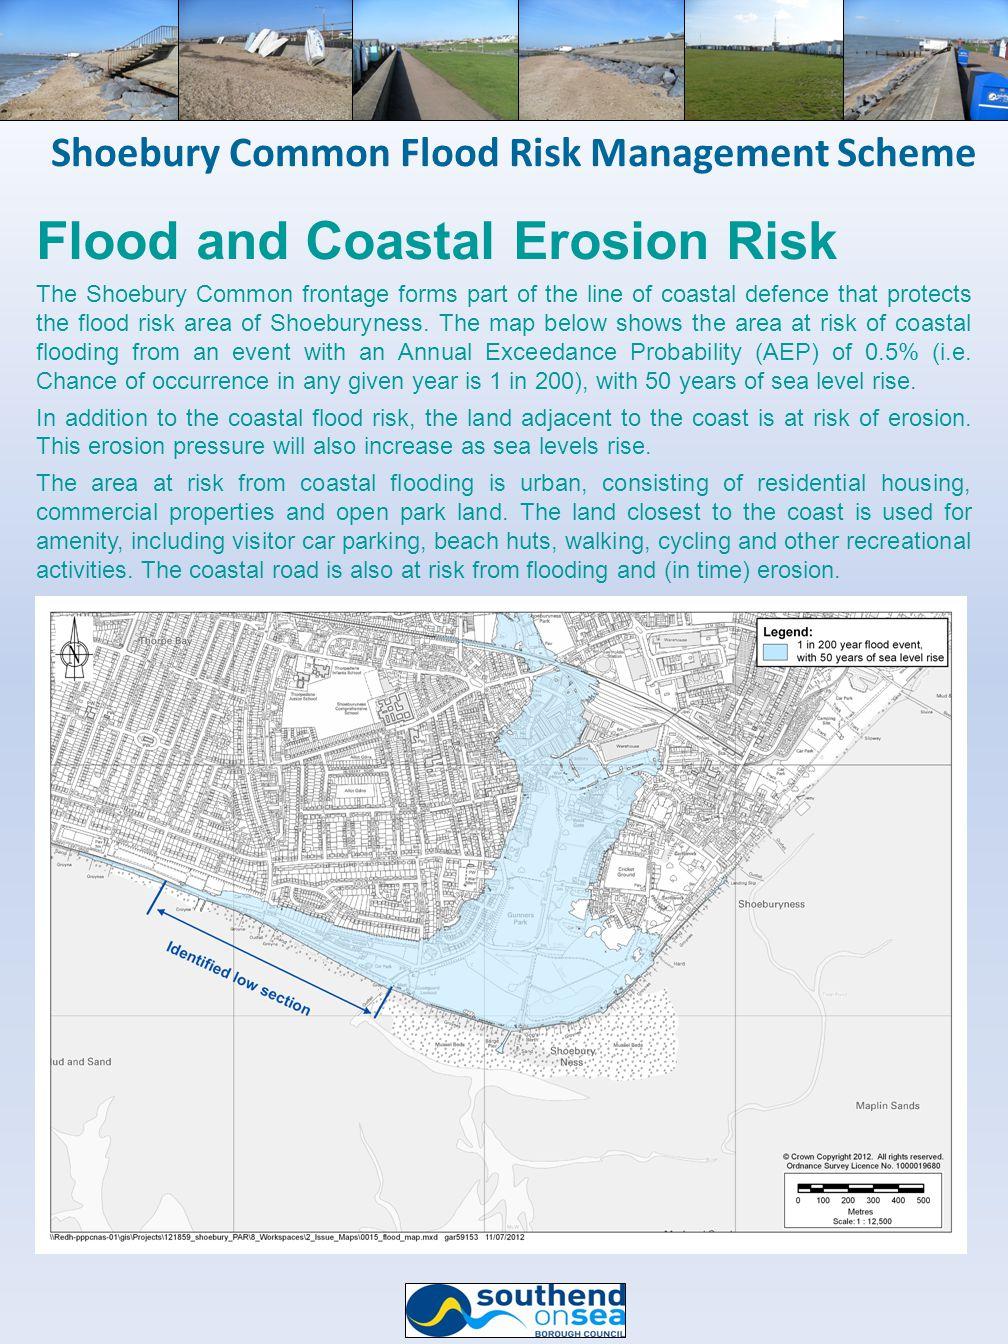 Shoebury Common Flood Risk Management Scheme Flood and Coastal Erosion Risk The Shoebury Common frontage forms part of the line of coastal defence tha